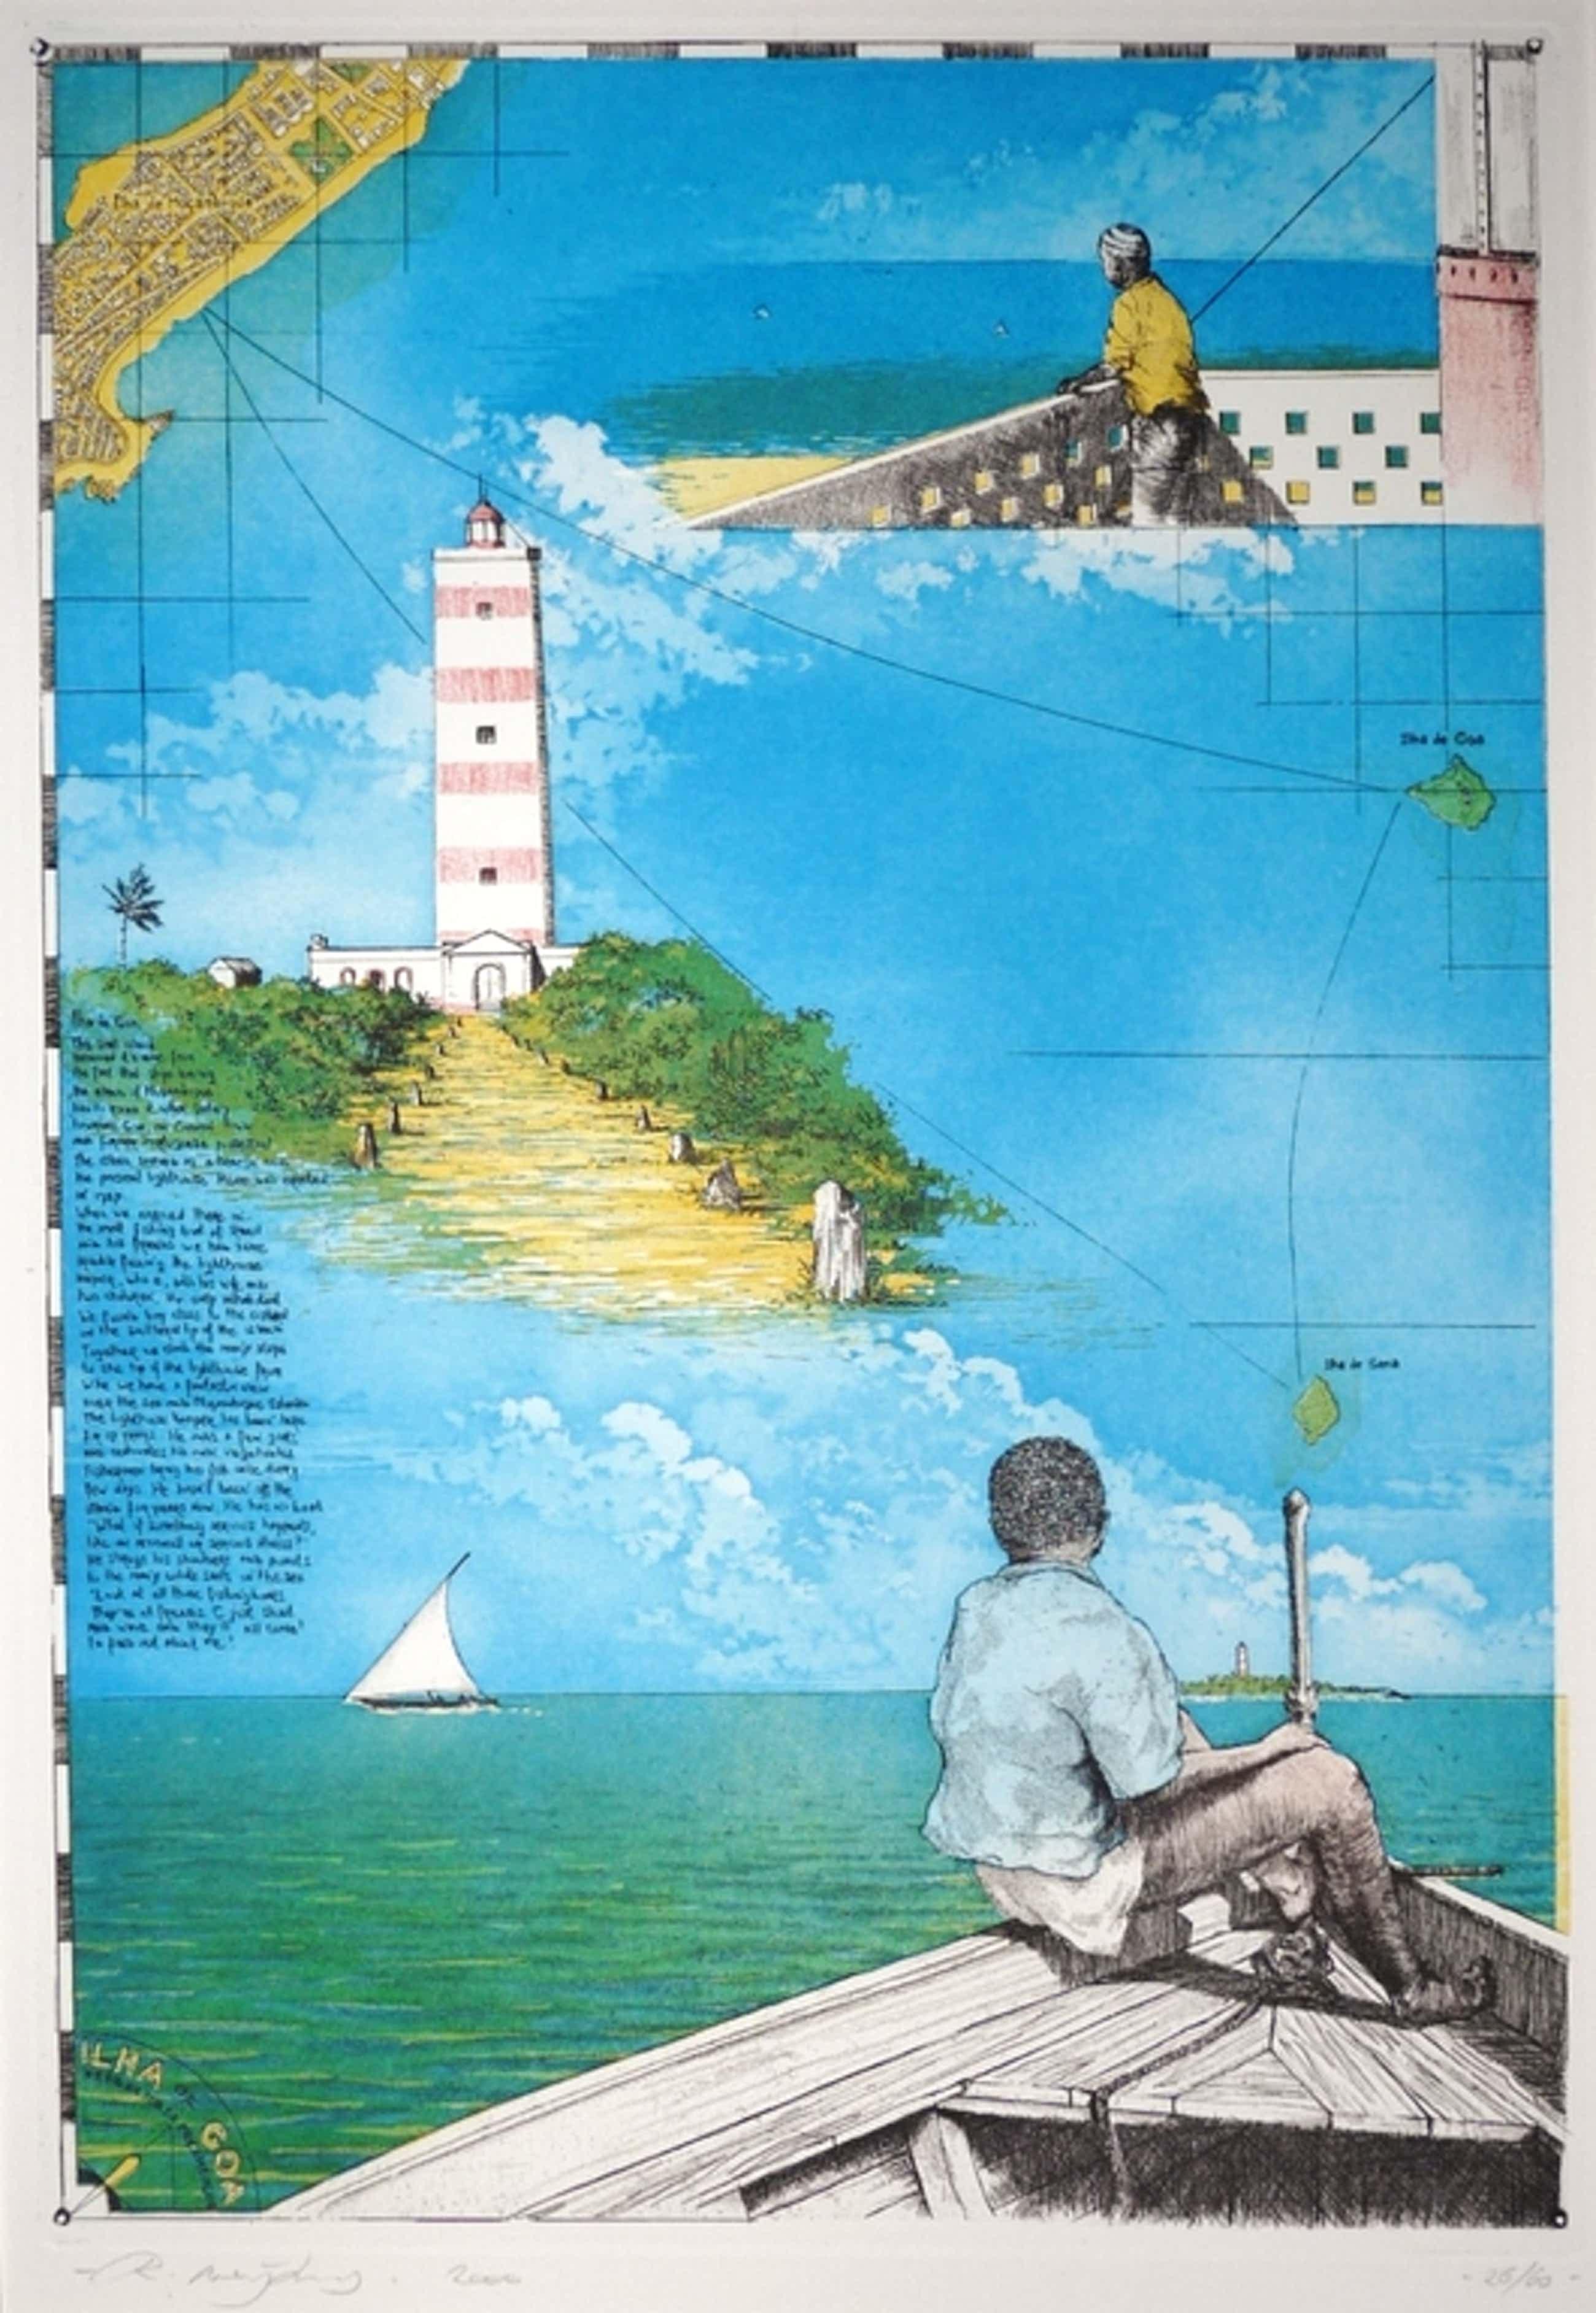 Rolf Weijburg, Kleurets, Ilha de Goa, Rep. de Mozambique kopen? Bied vanaf 90!